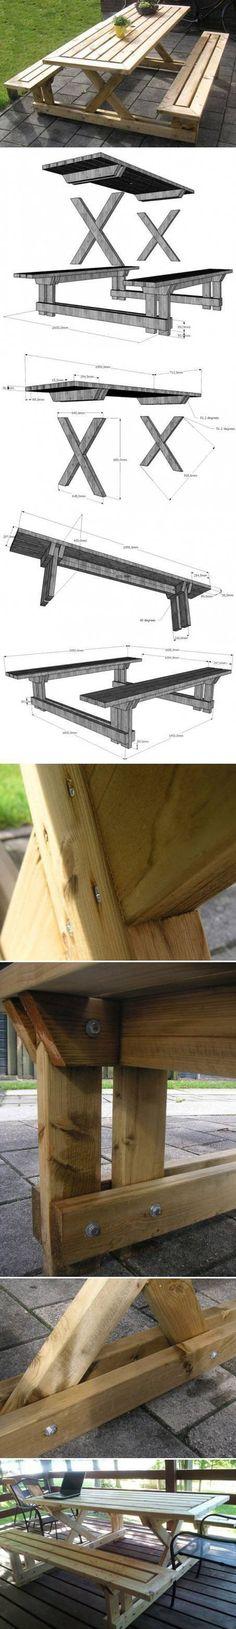 stylowi_pl_diy-zrob-to-sam_diy-garden-bench-and-table-diy-projects--usefuldiy_11596556